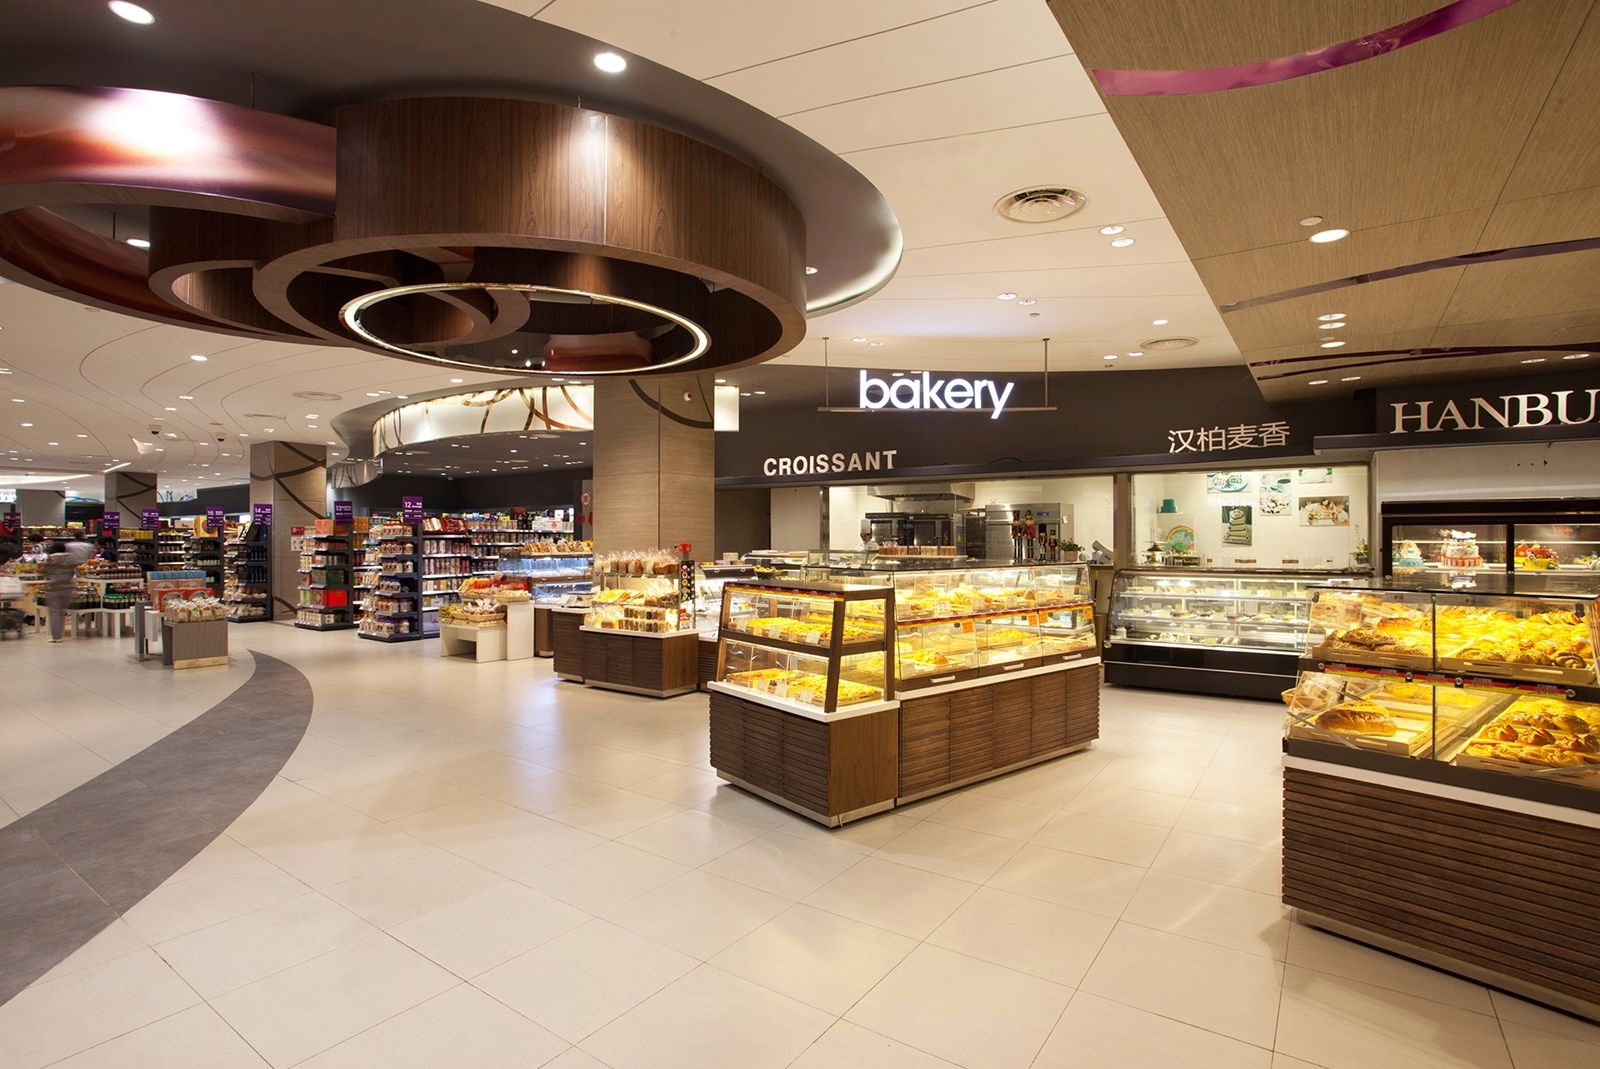 bb supermarket bakeries unclear - HD1600×1069